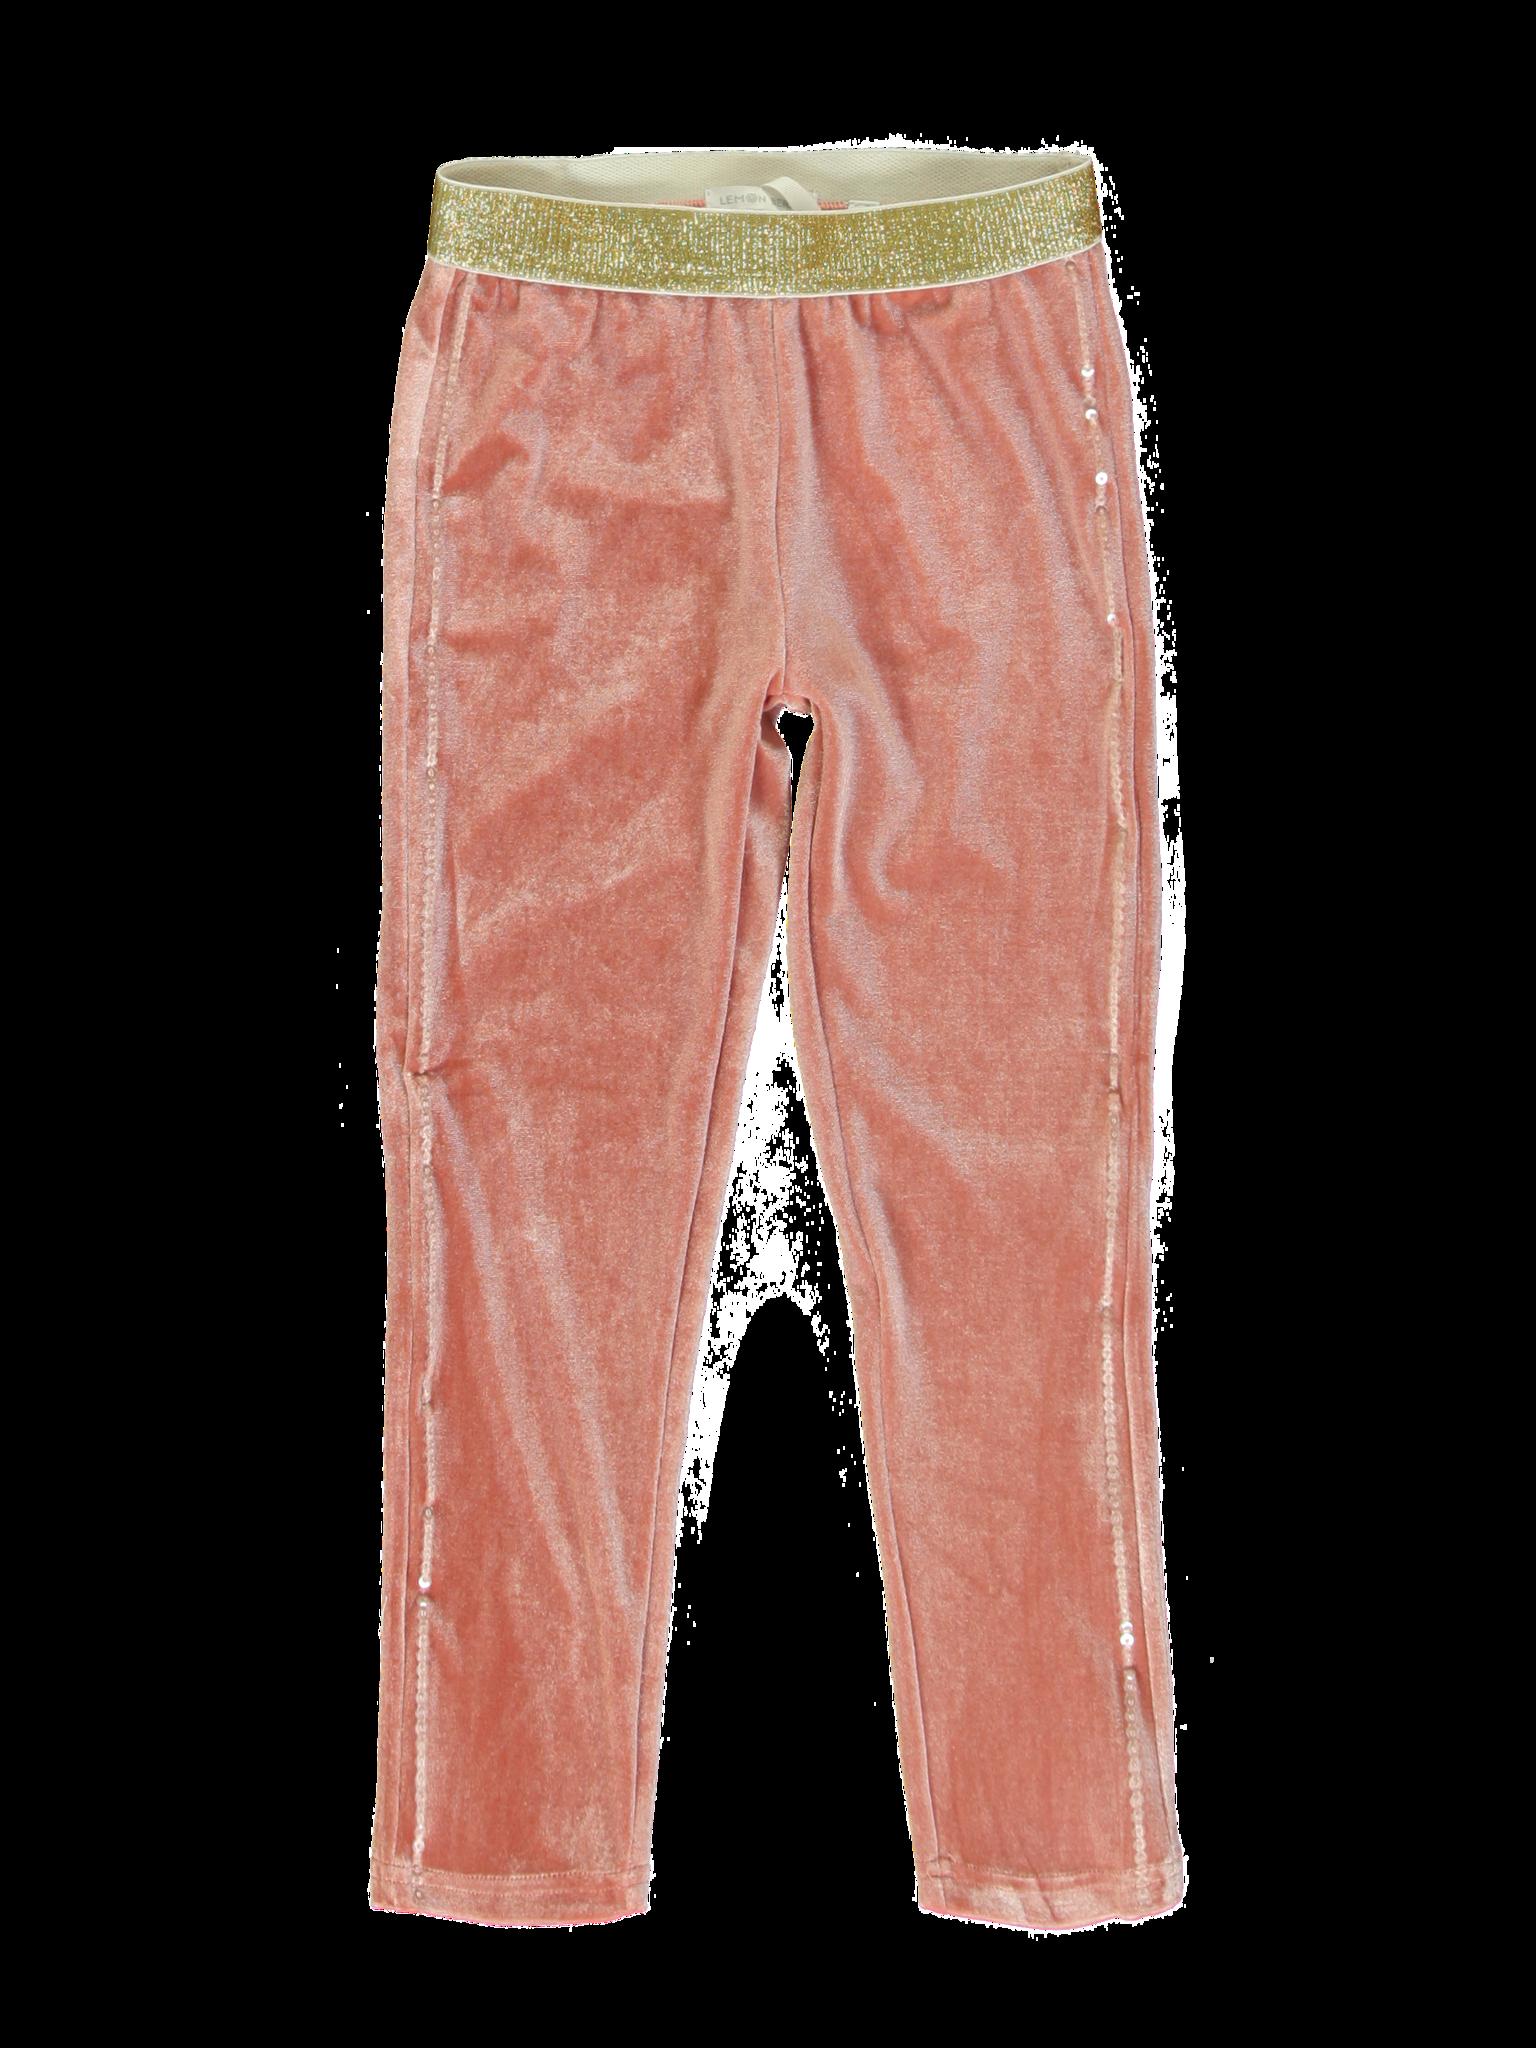 All Brands   Winterproducts Small Girls   Legging   12 pcs/box